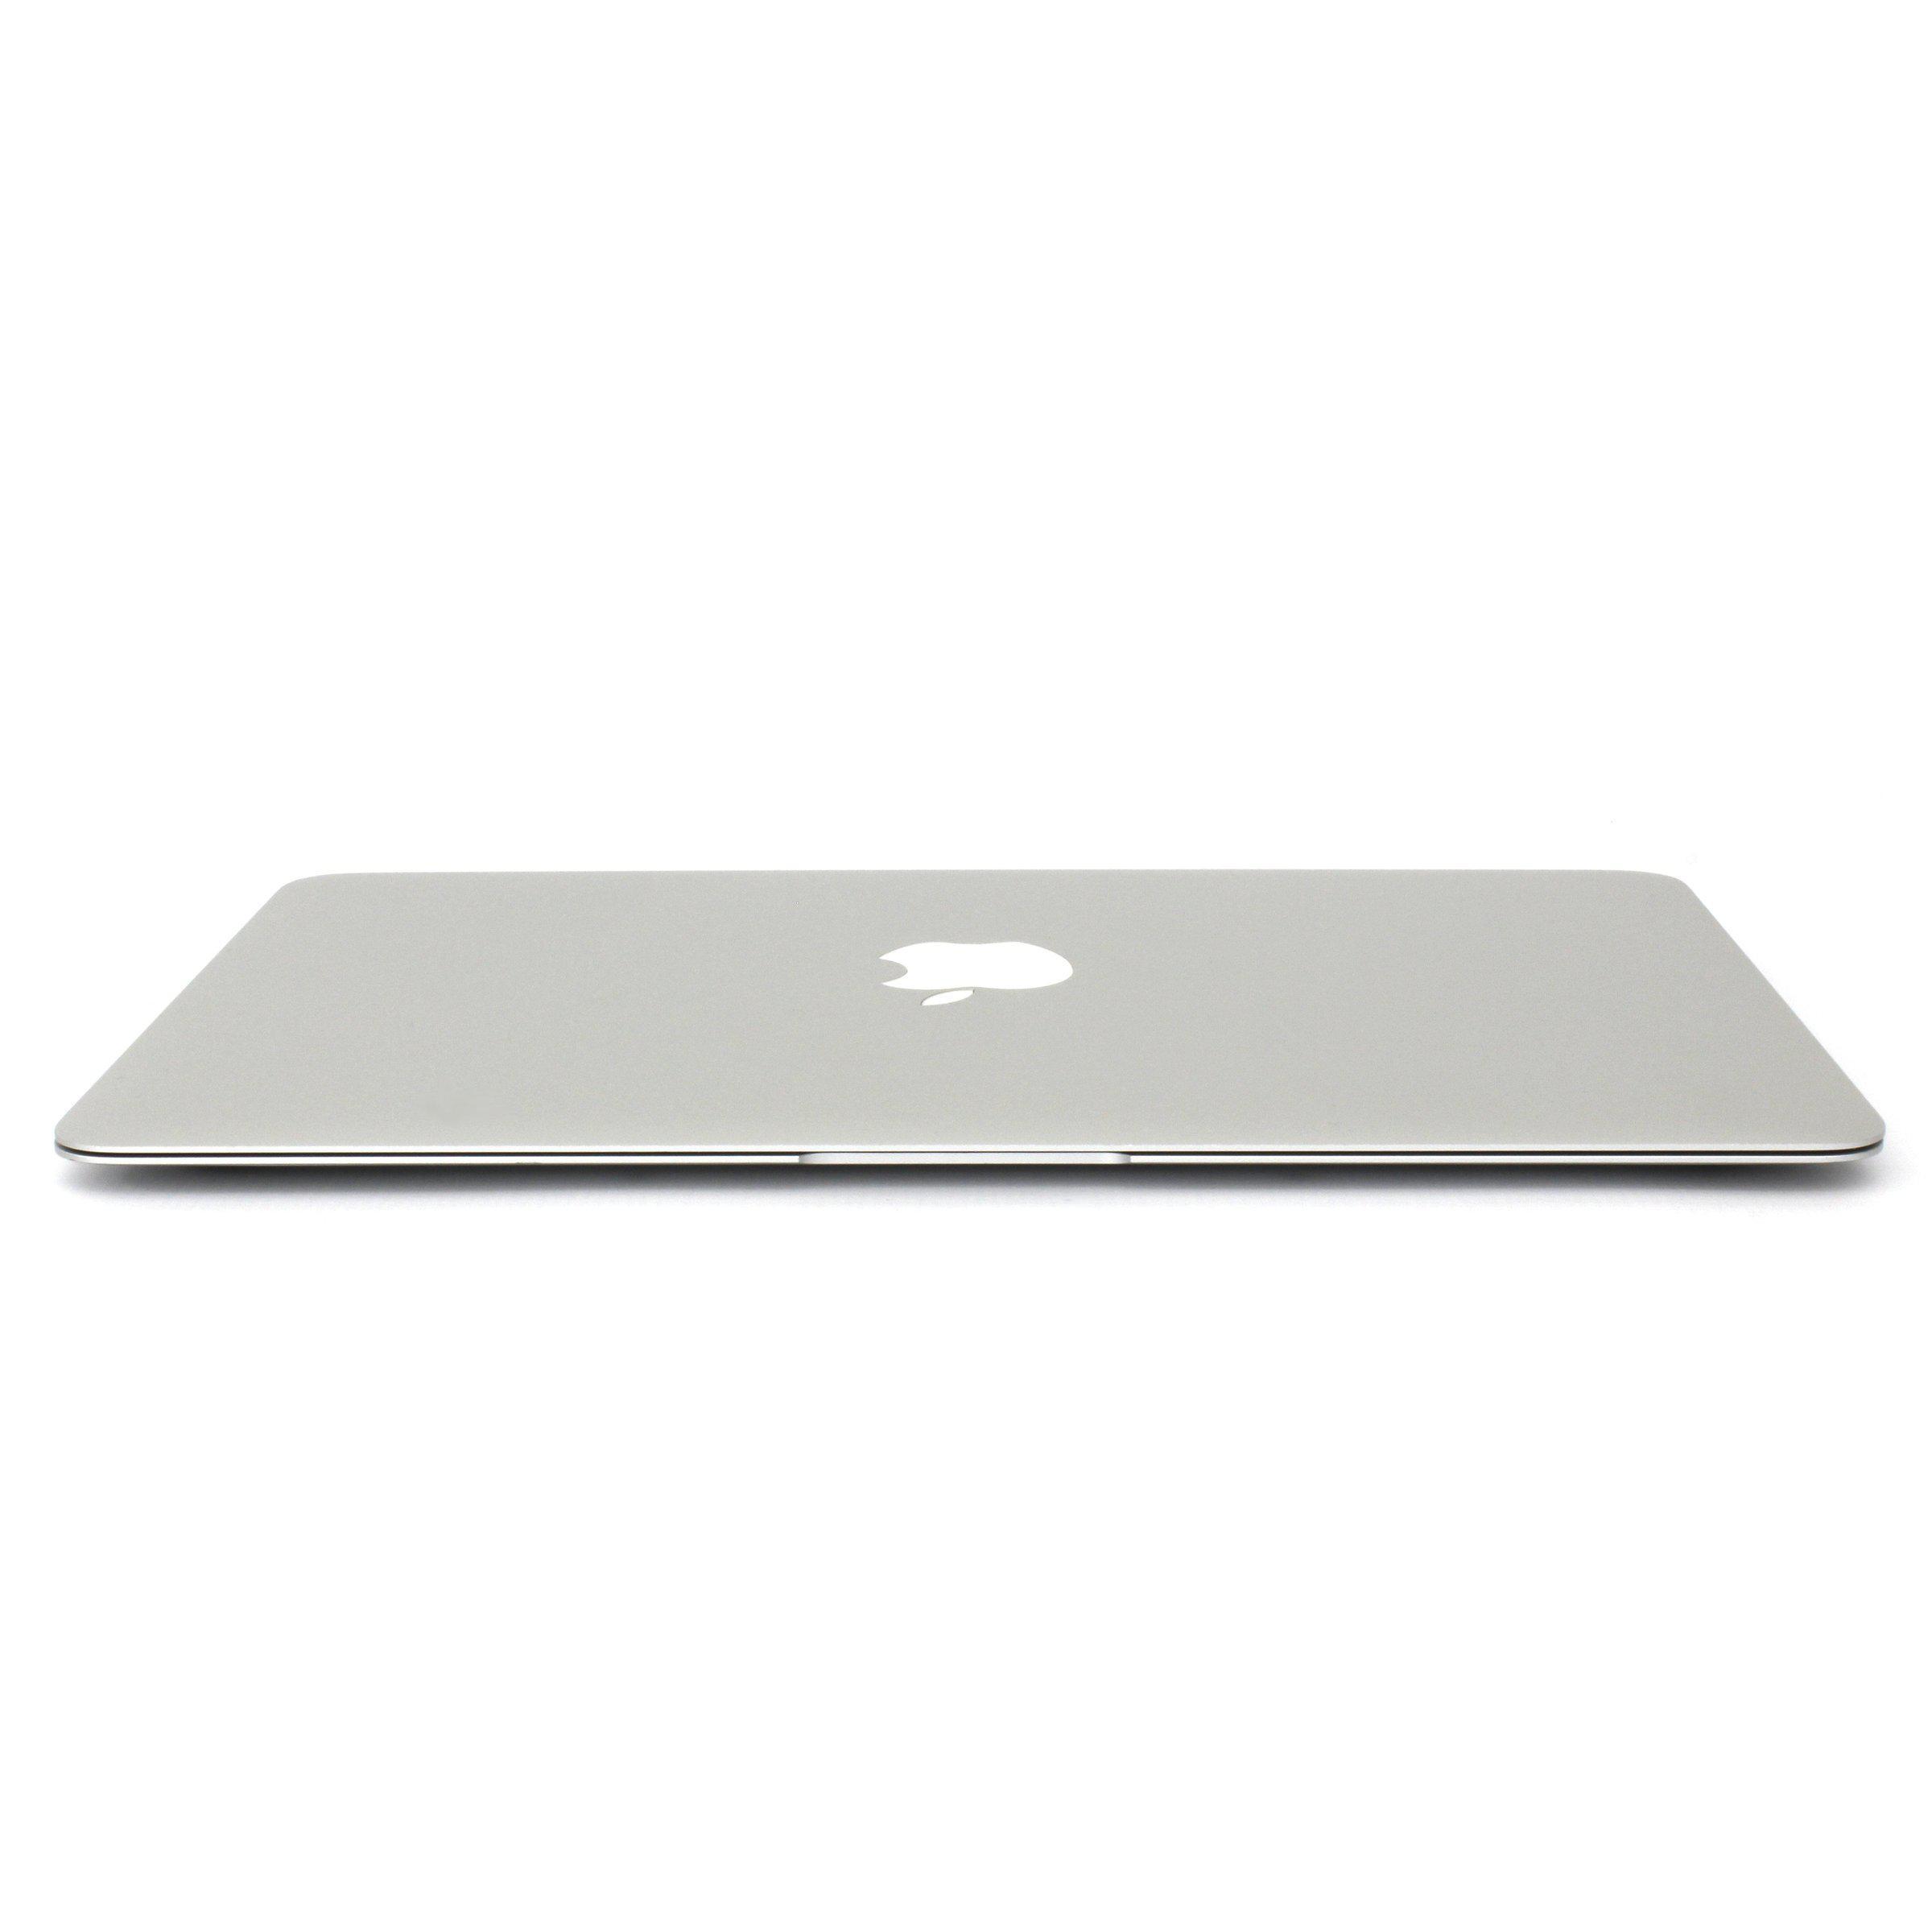 "MacBook Air 11"" (2011) - Core i5 1,6 GHz - SSD 64 GB - 2GB - QWERTY - Engels (VS)"